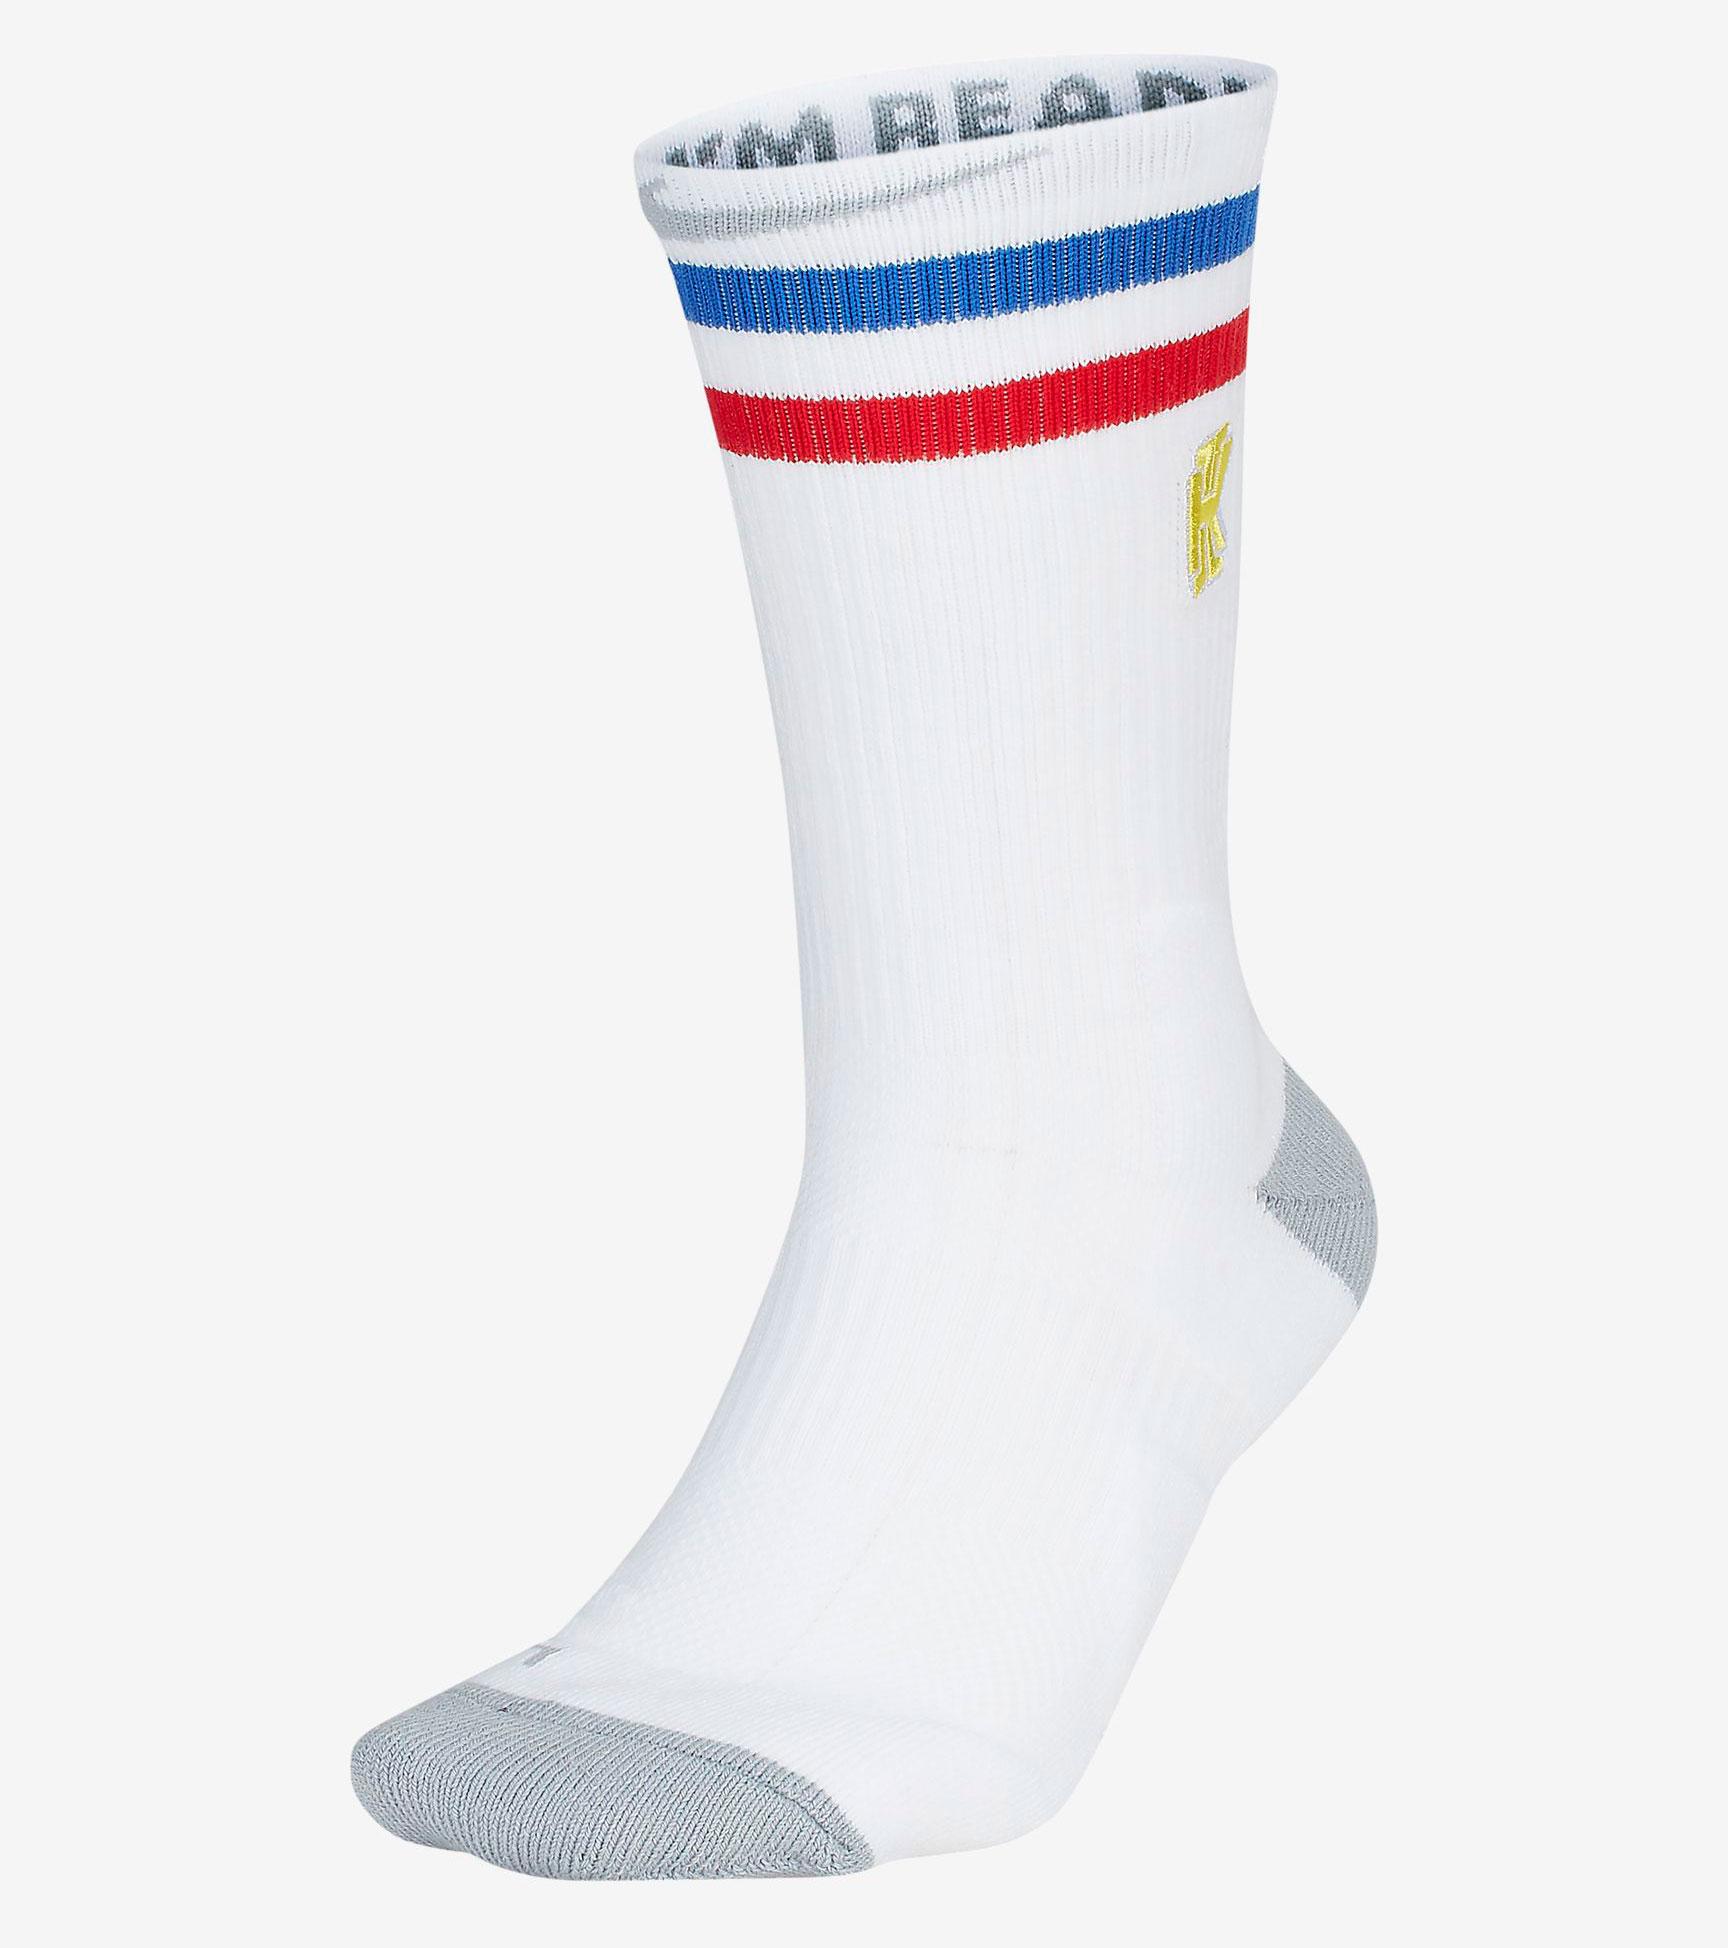 nike-kyrie-spongebob-socks-1